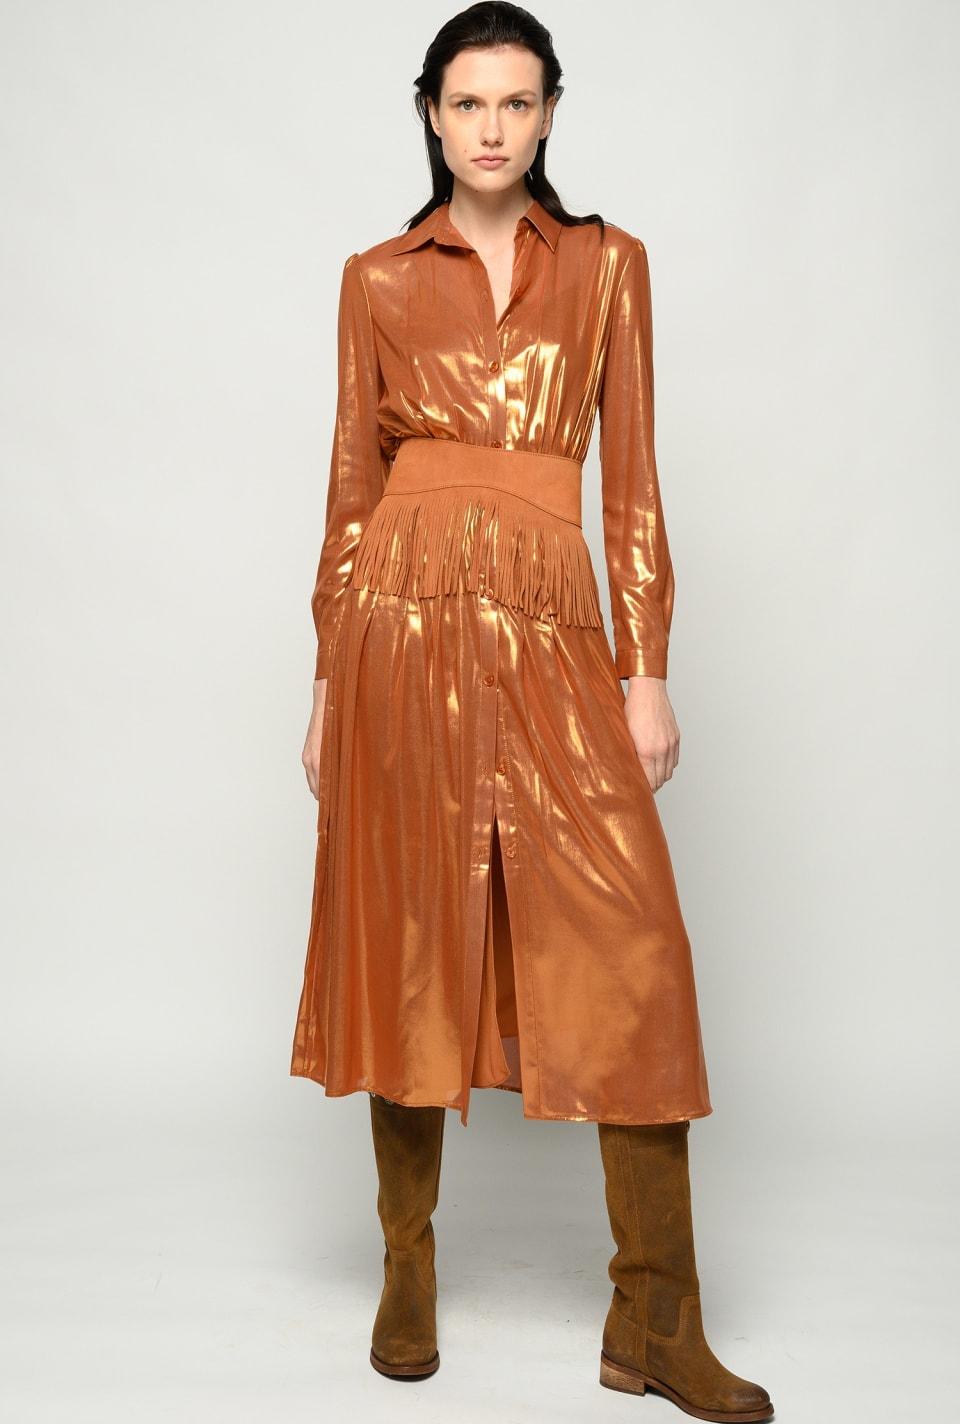 Midi-length lamé shirt dress - Pinko